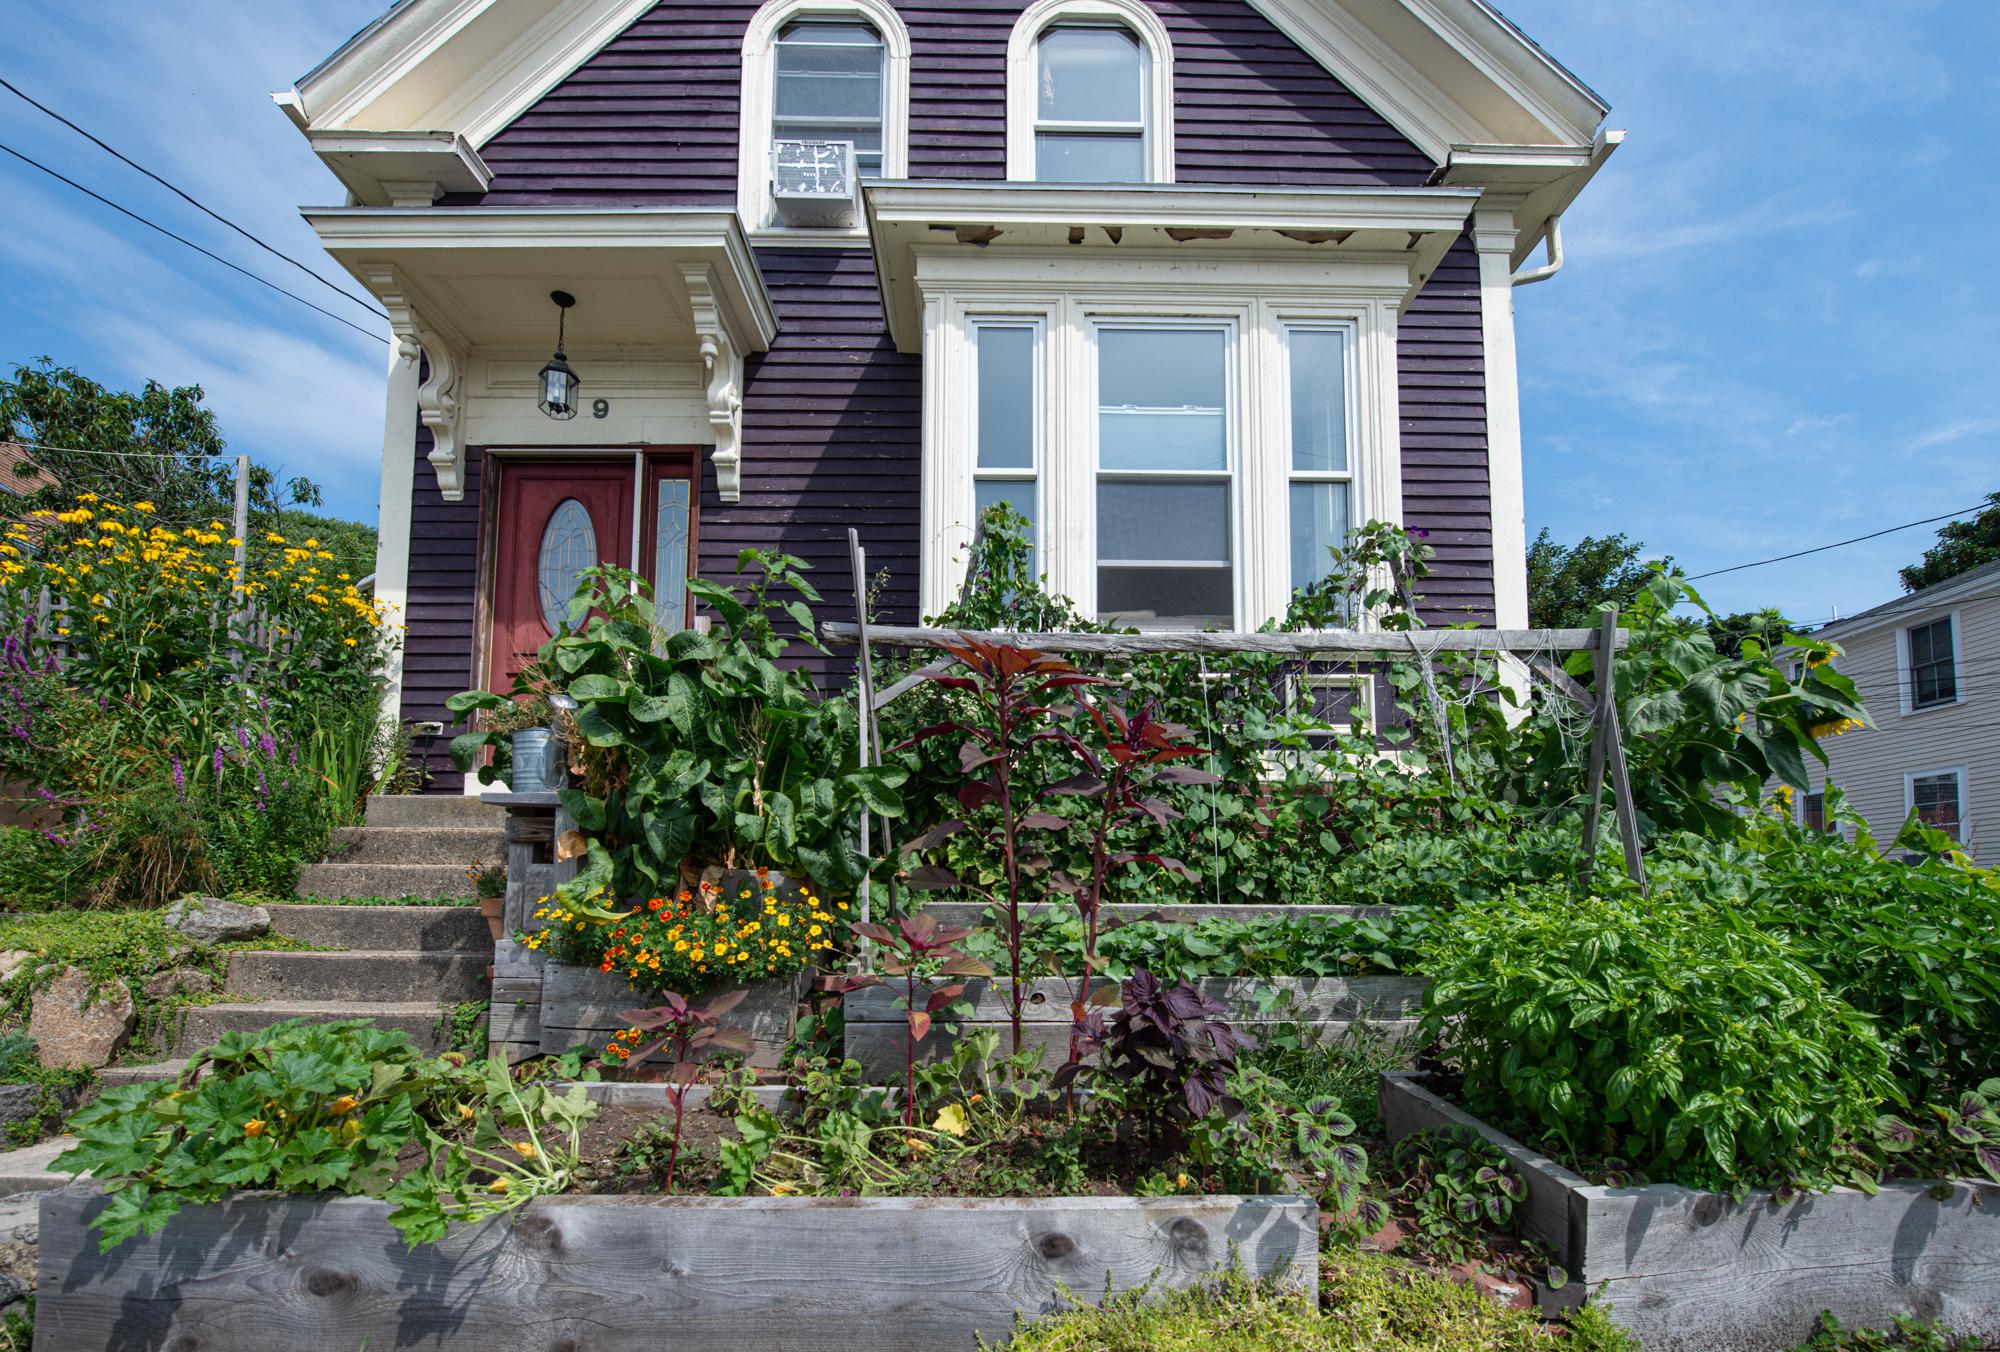 The Home and Garden of Back Yard Growers Founders, Lara Lepionka and Stevens Brosnihan (Photo: David Newsom)